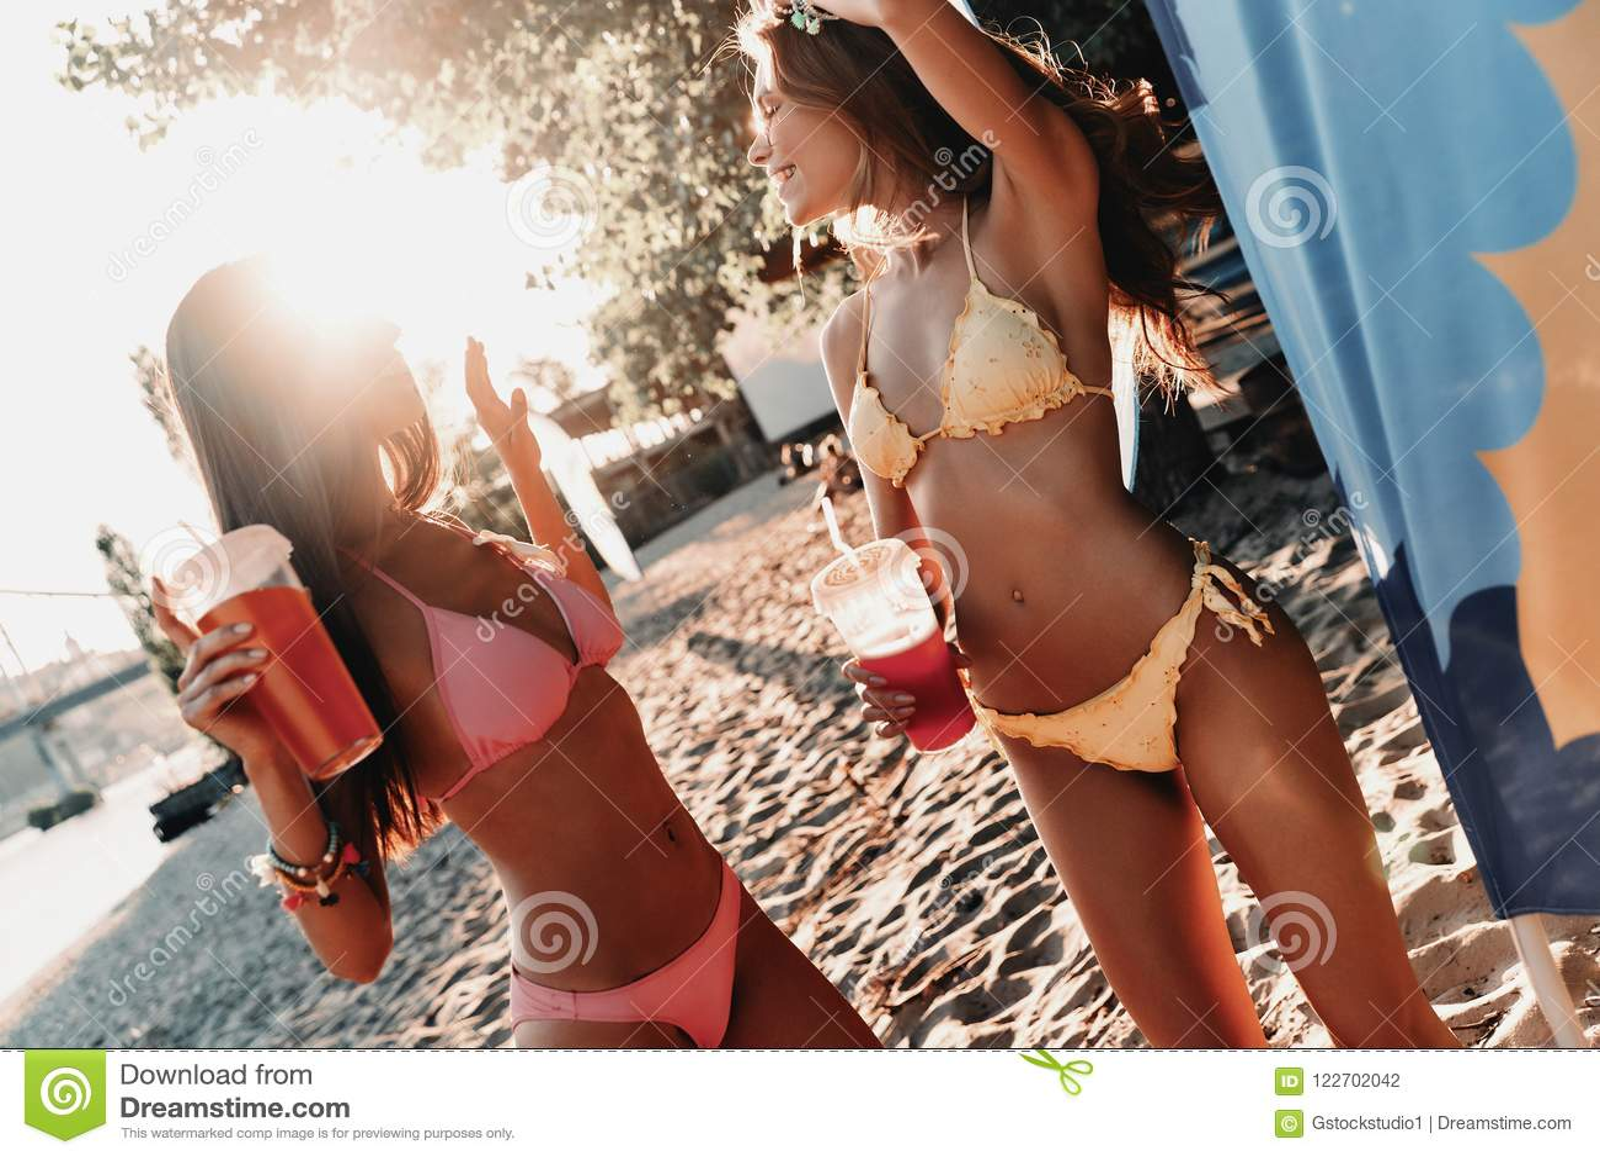 Hot erotic women having fun